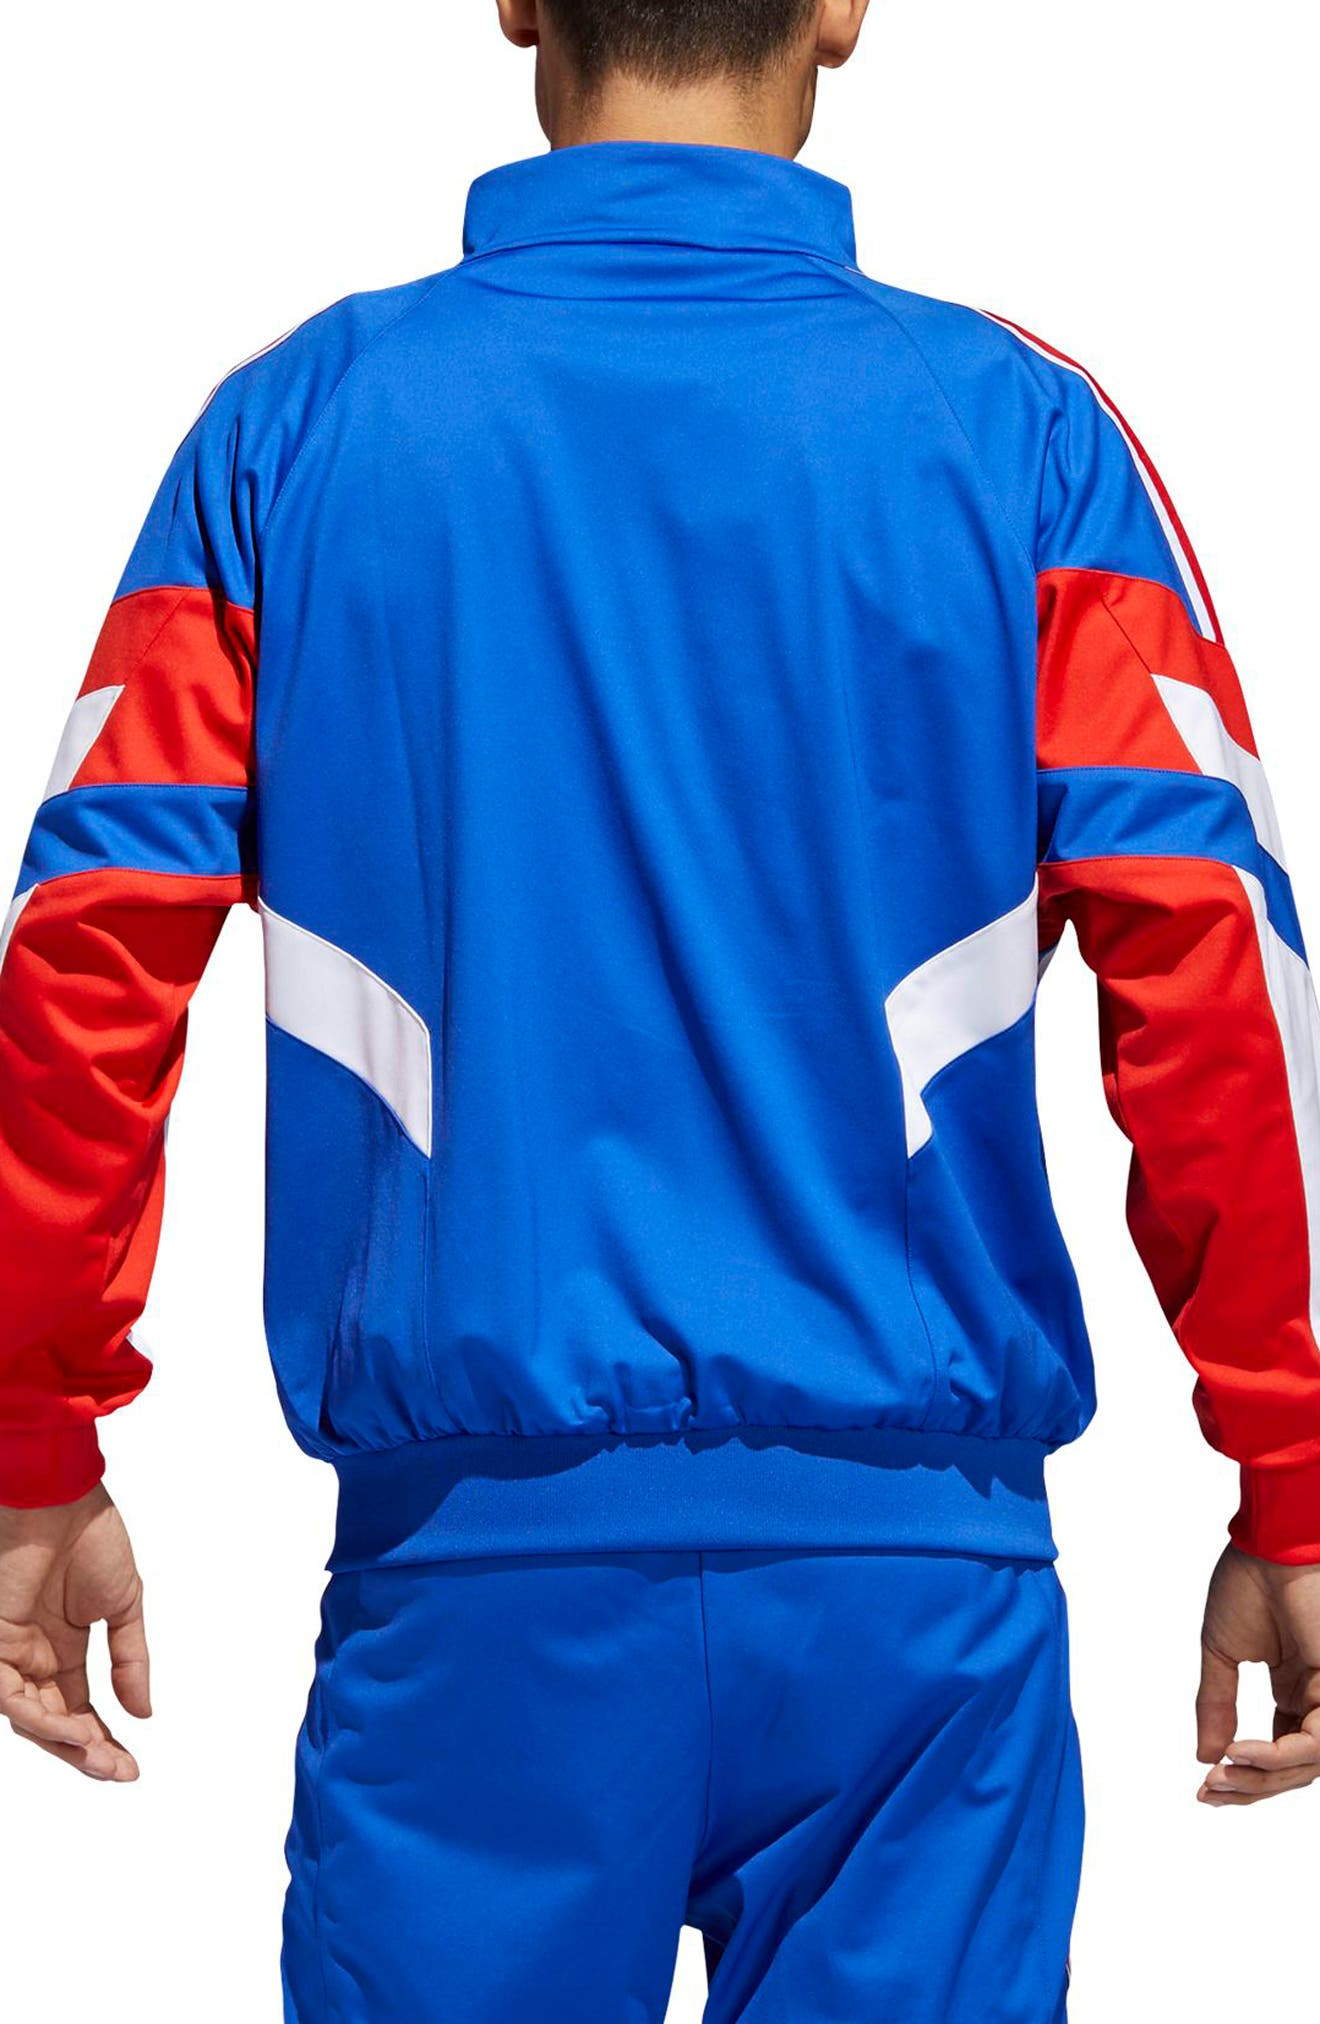 Aloxe Track Jacket,                             Alternate thumbnail 2, color,                             400